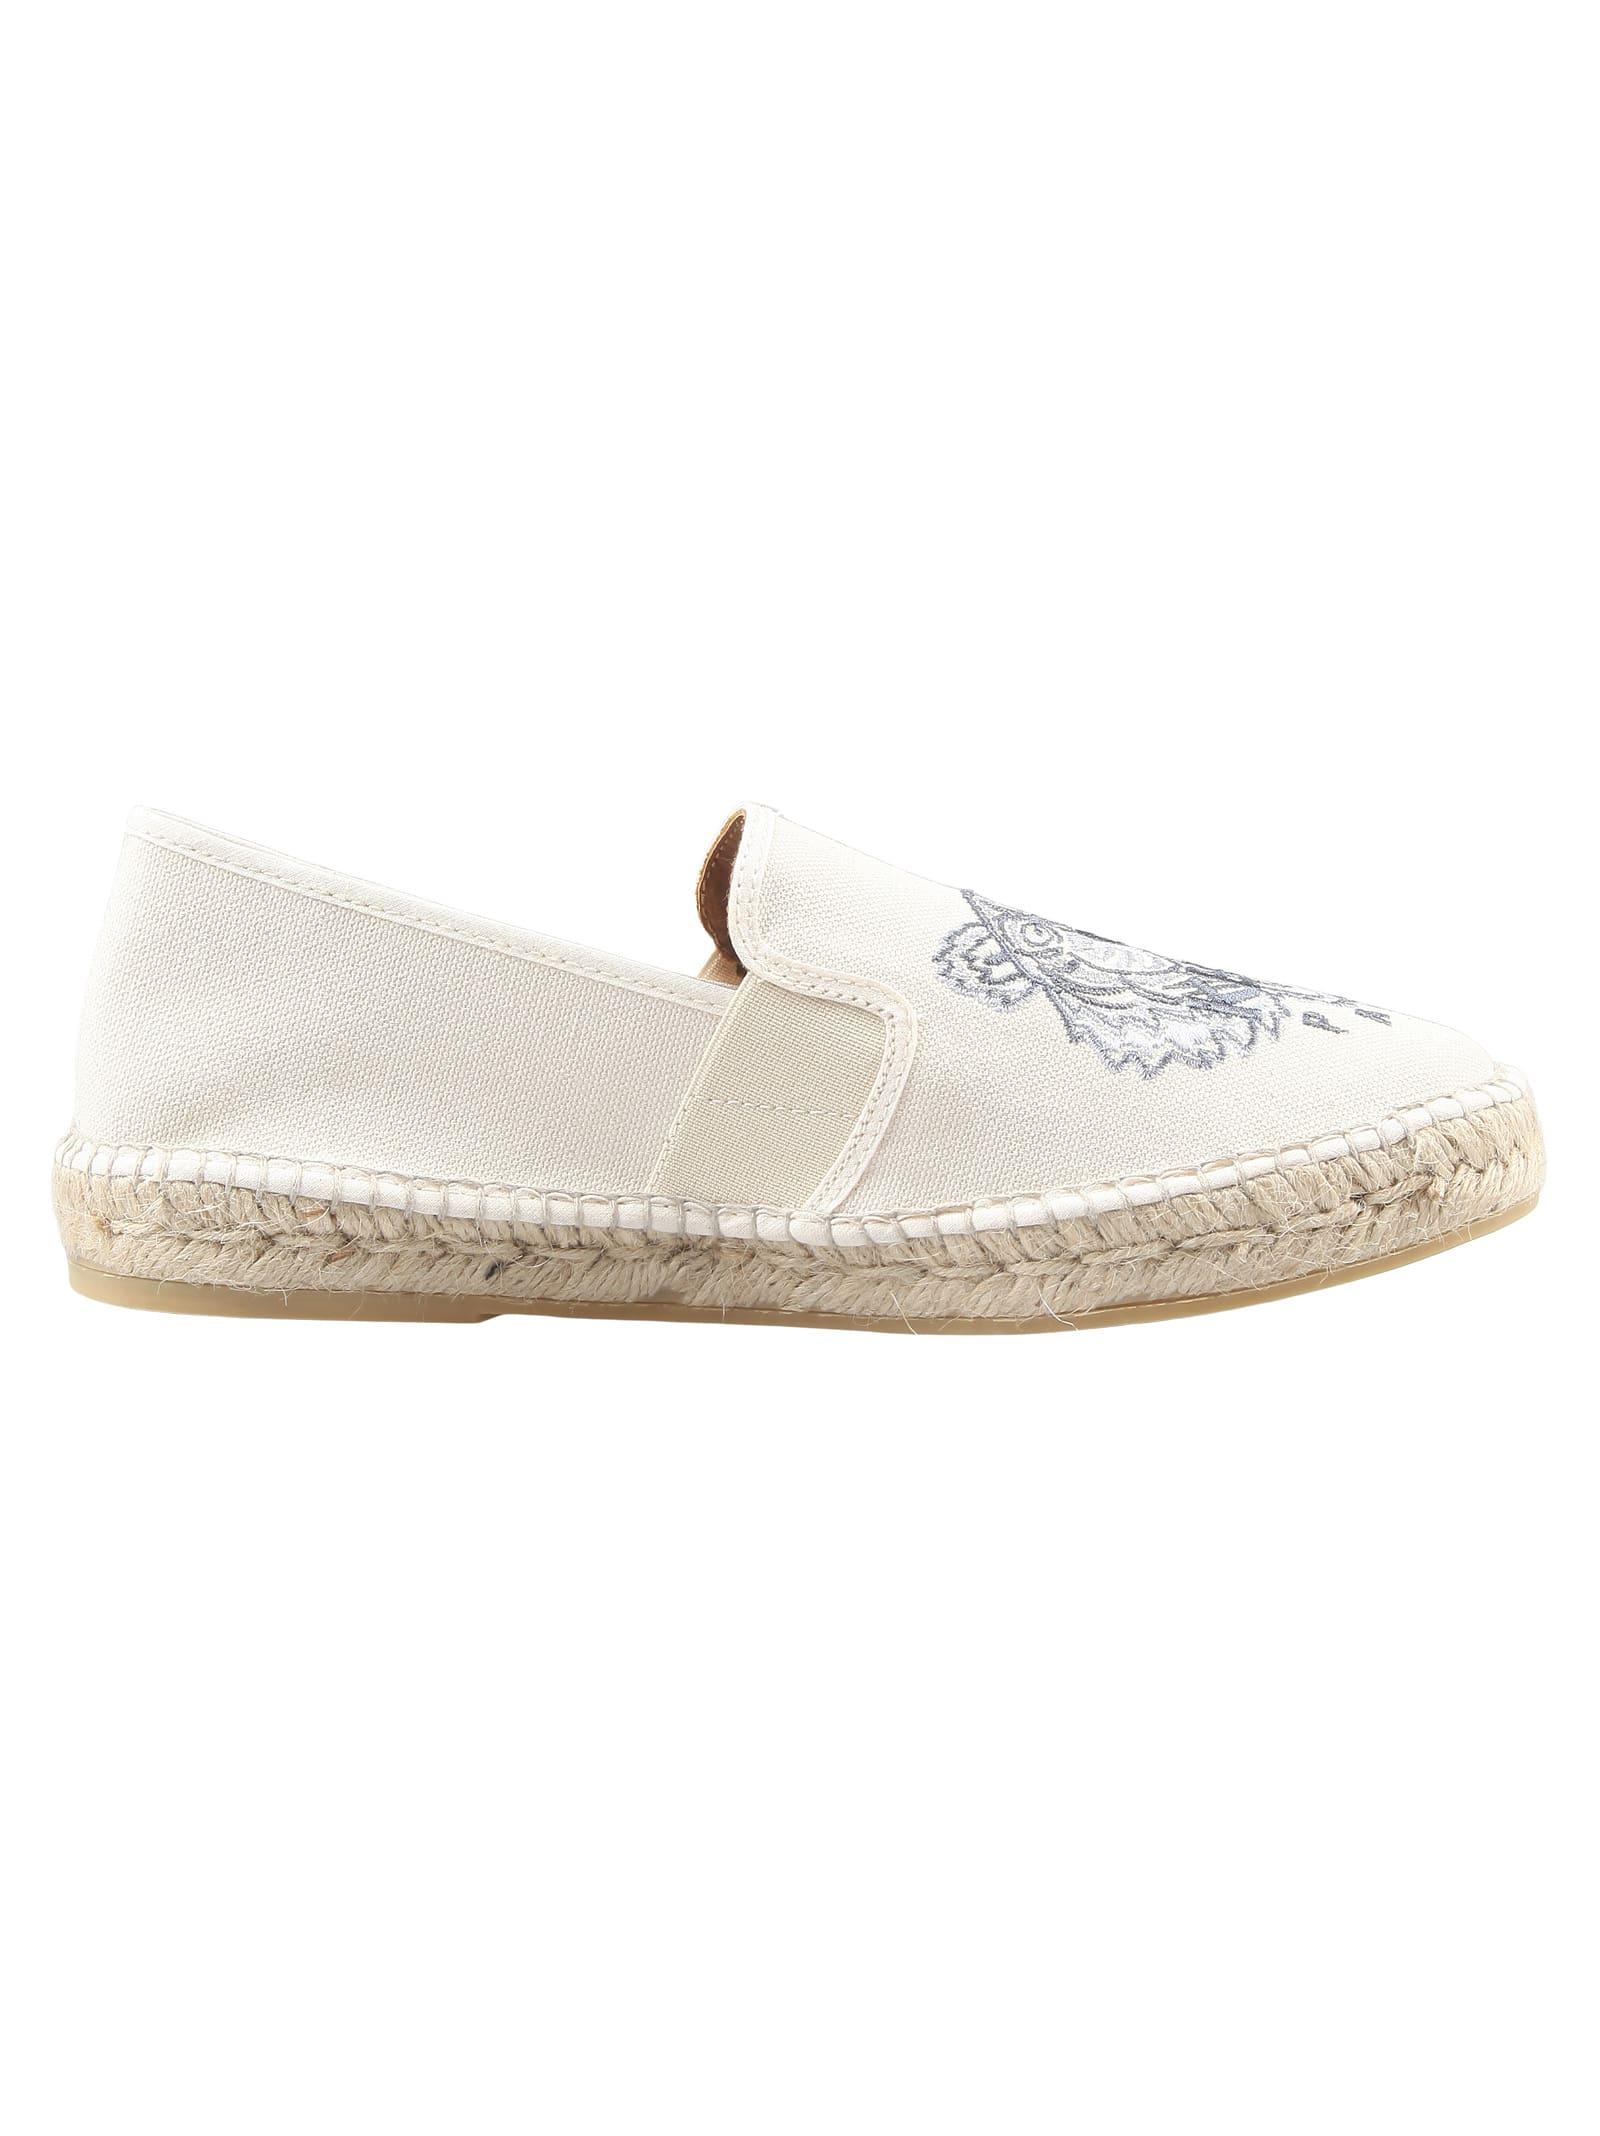 Kenzo Loafers \u0026 Boat Shoes | italist